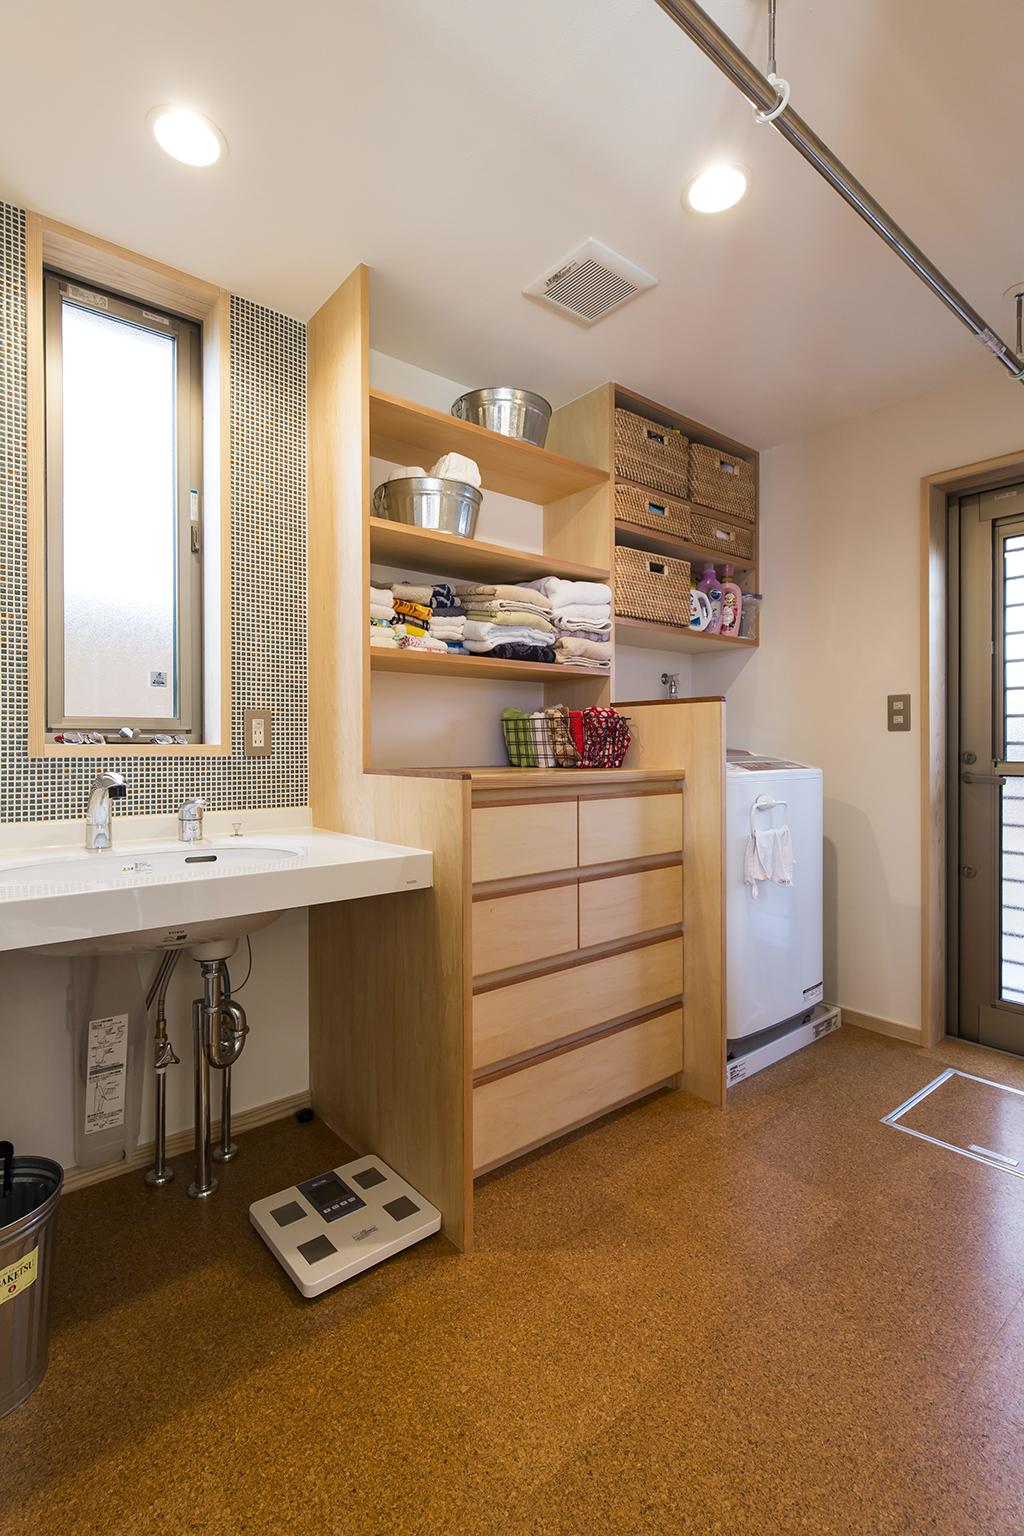 高砂市の木の家 洗面洗濯脱衣室